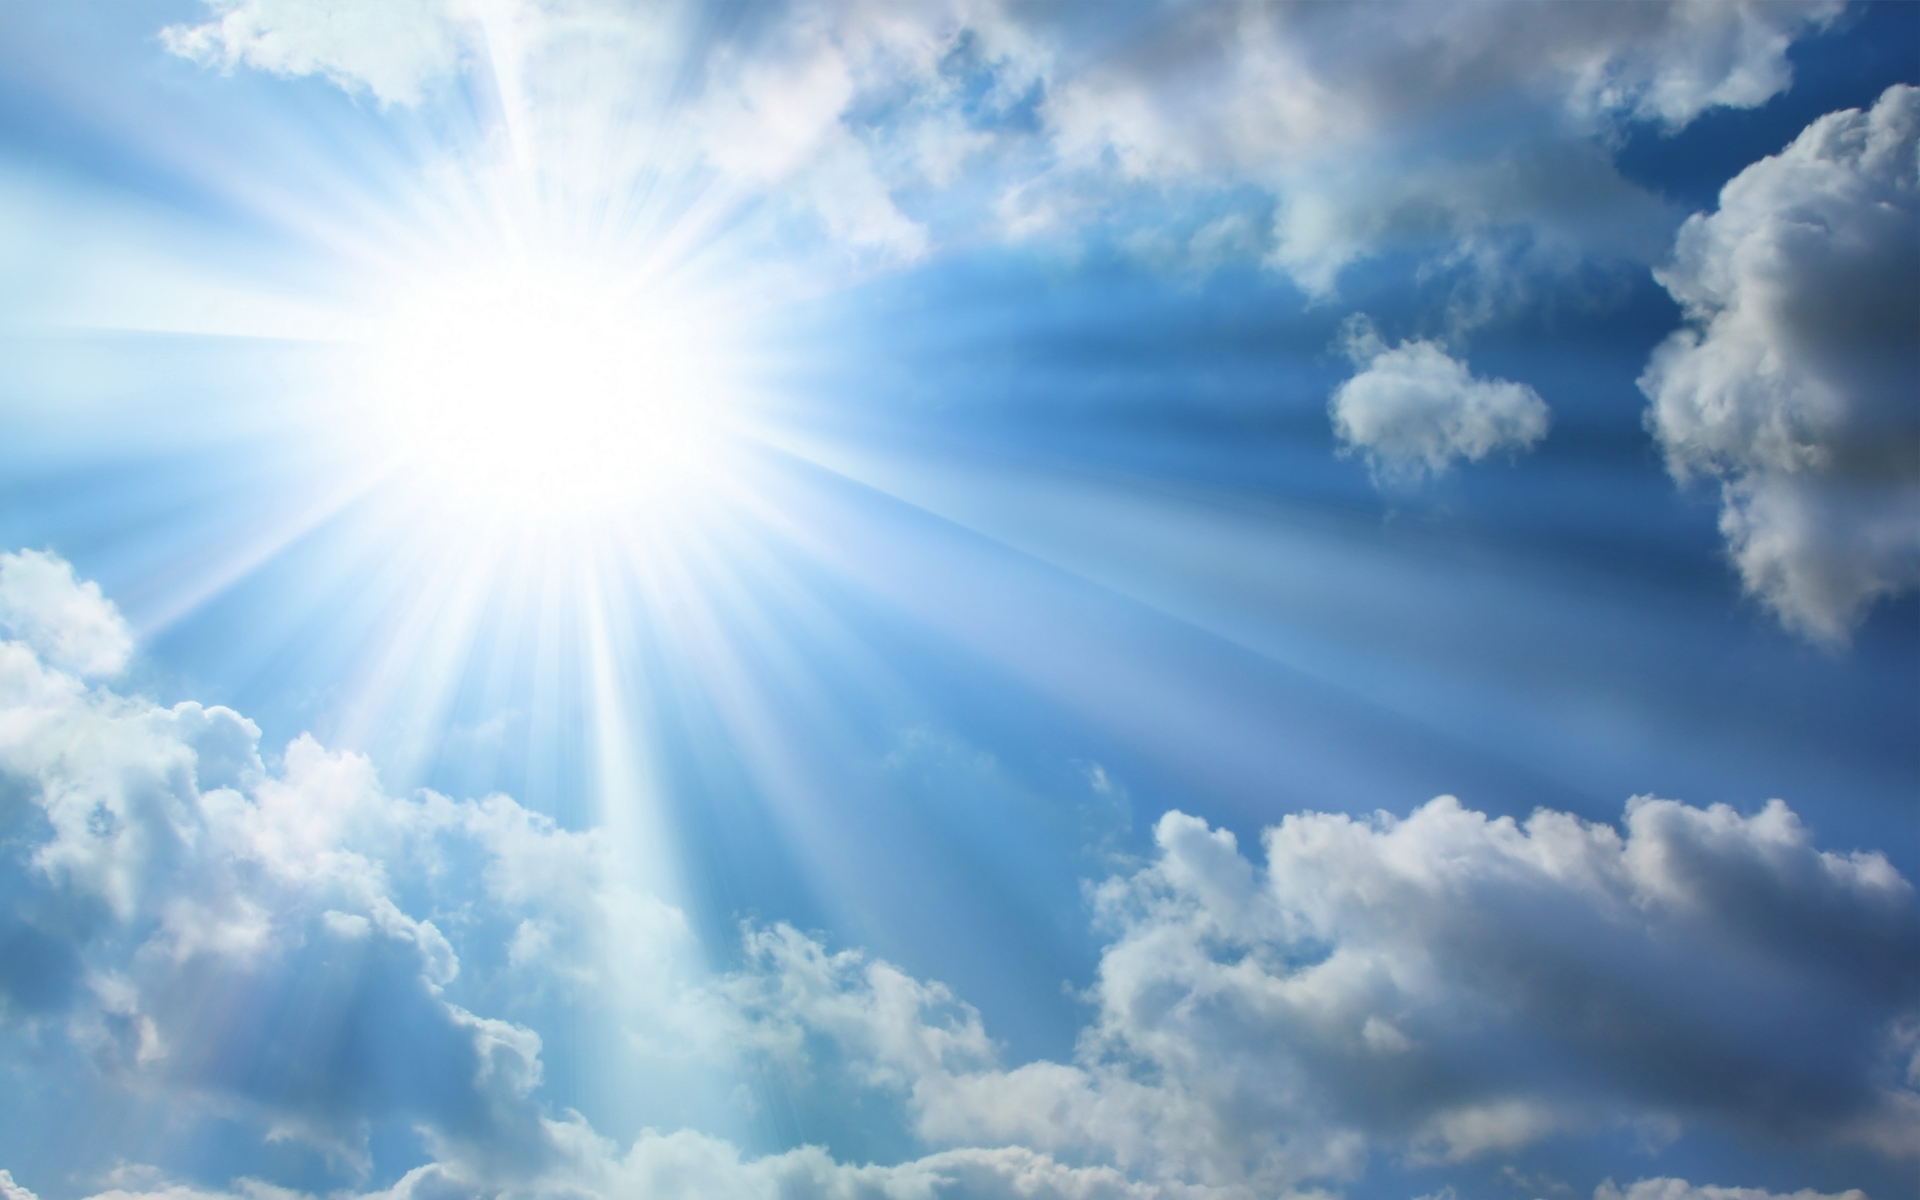 Sky With Sun Wallpaper High Definition 6151 Aquagas Pty Ltd